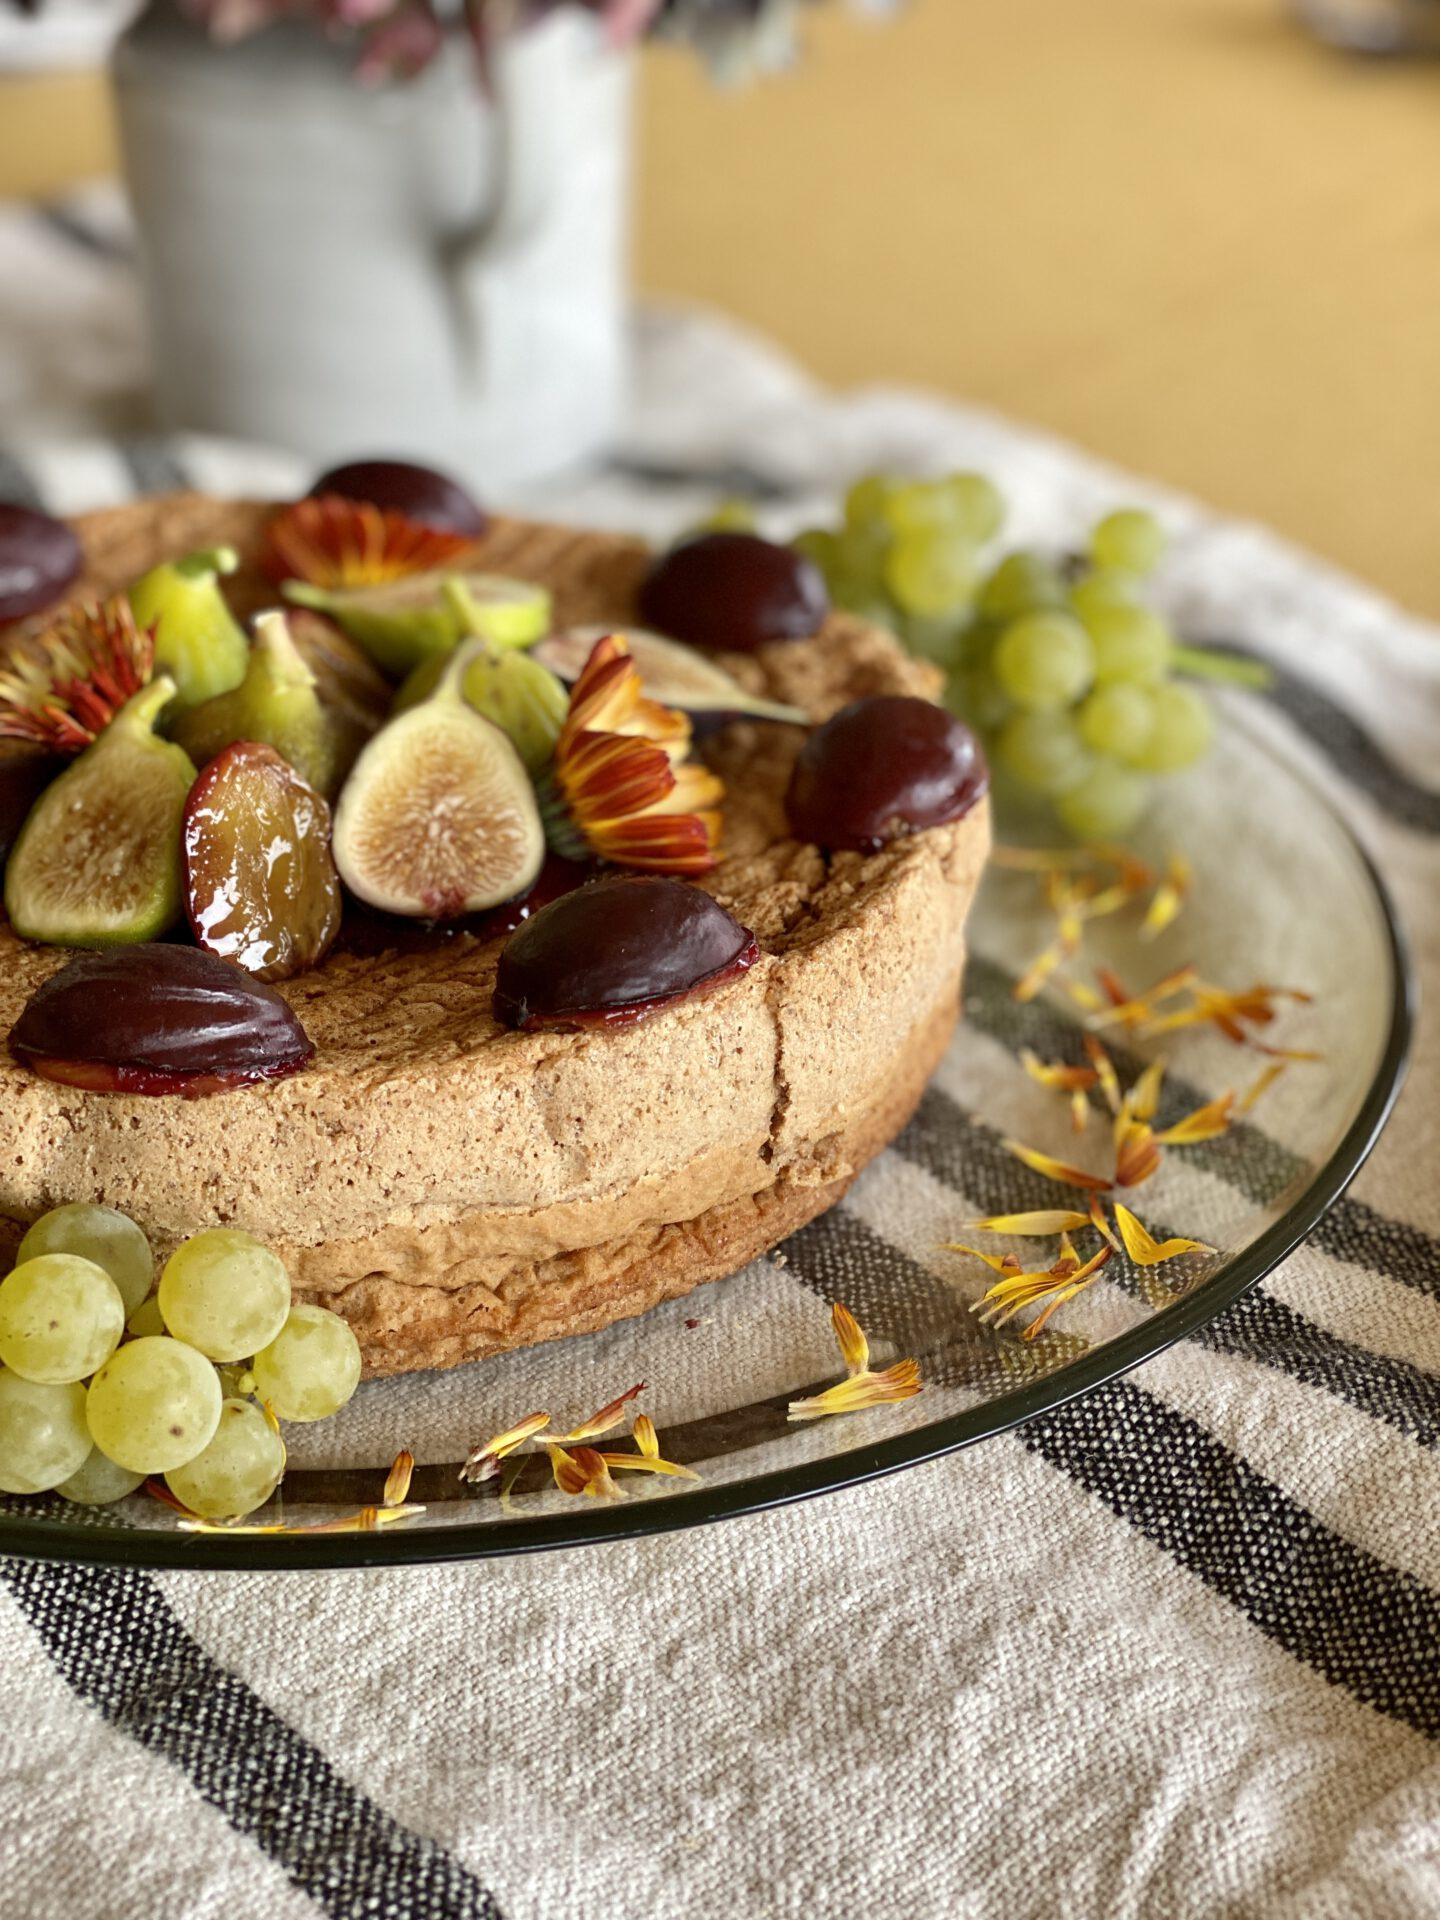 flourless walnut spice cake on a platter.